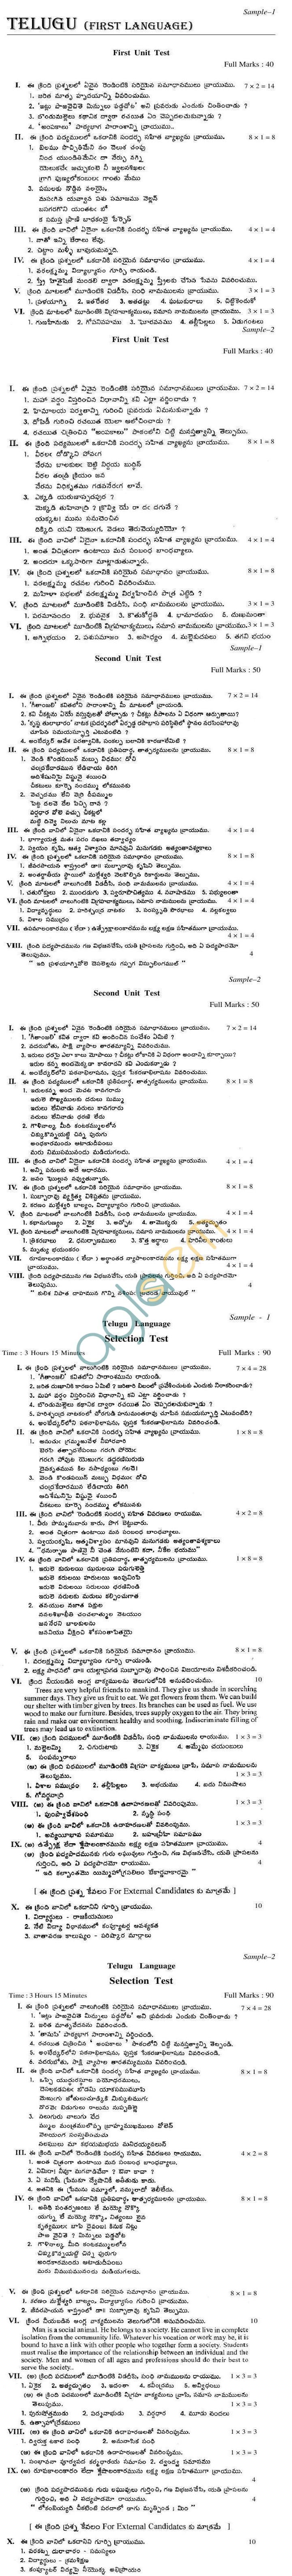 WB Board Sample Question Papers for Madhyamik Pariksha (Class 10) -Telugu